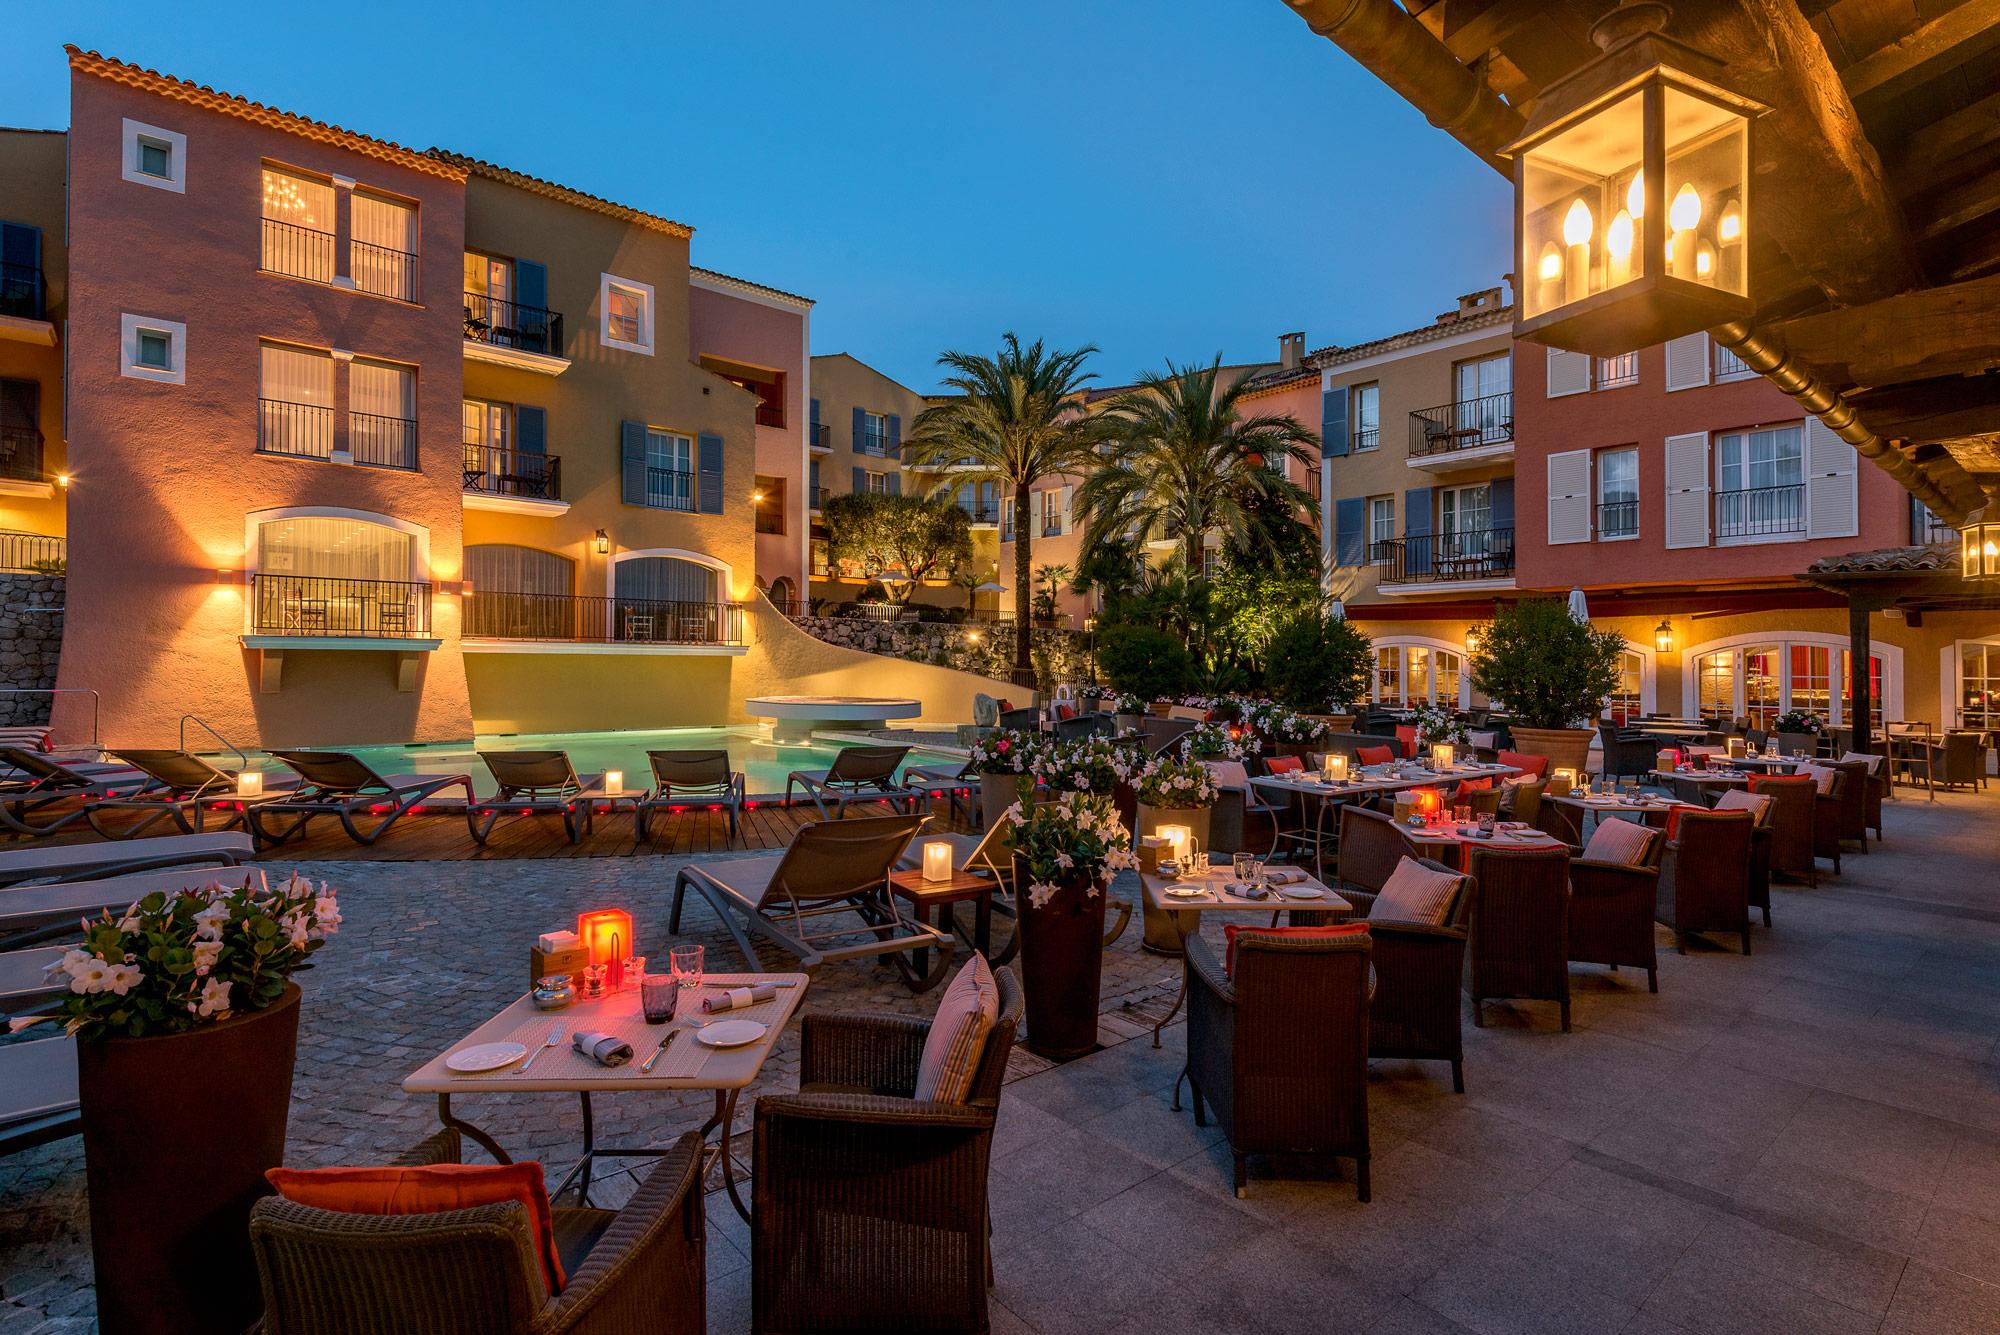 B-restaurant-by-the-pool-at-Byblos-Saint-Tropez